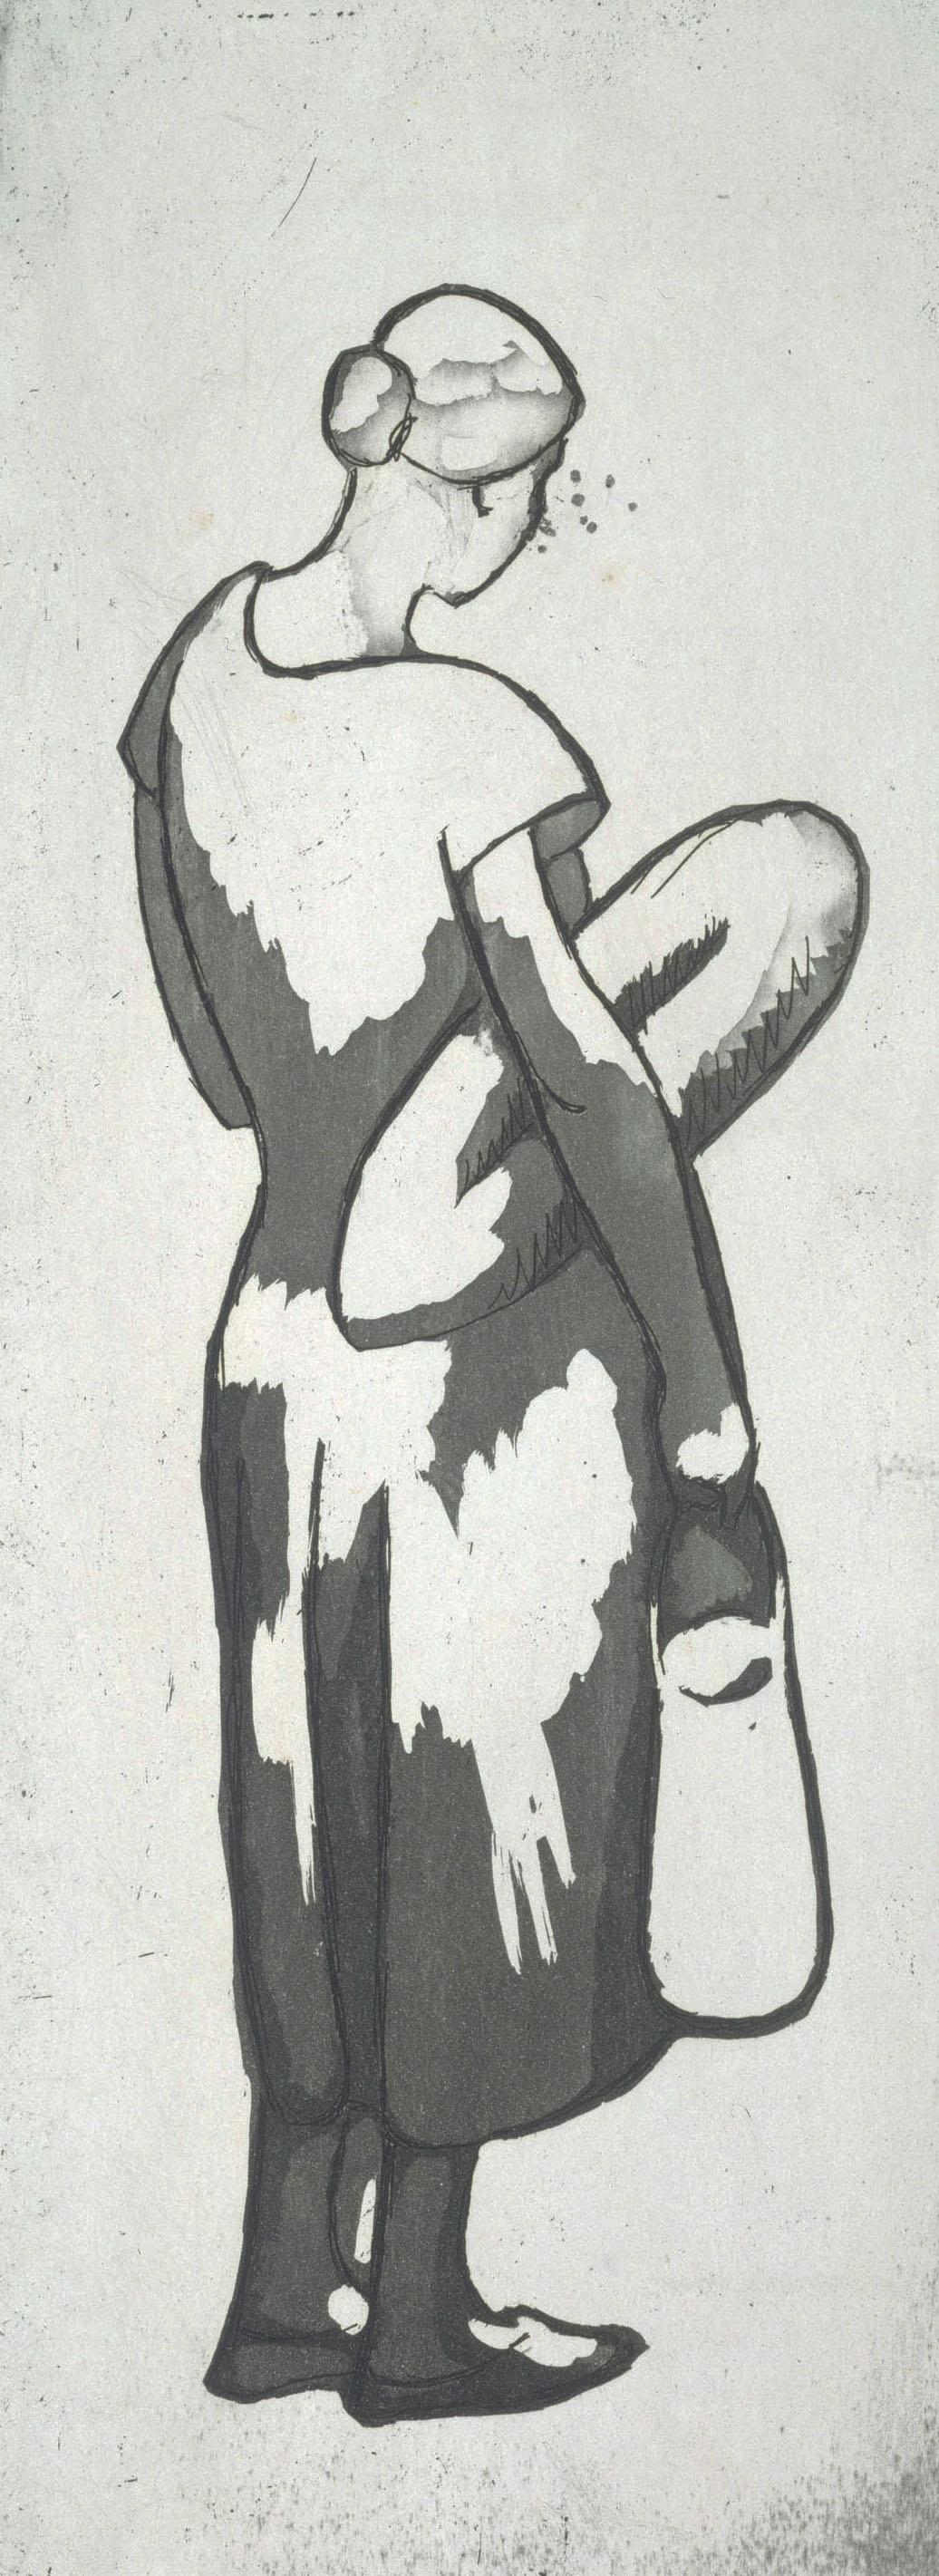 Juli González - Dona tornant del mercat, núm. 1 (Femme revenant du marché, no. 1) - 1927